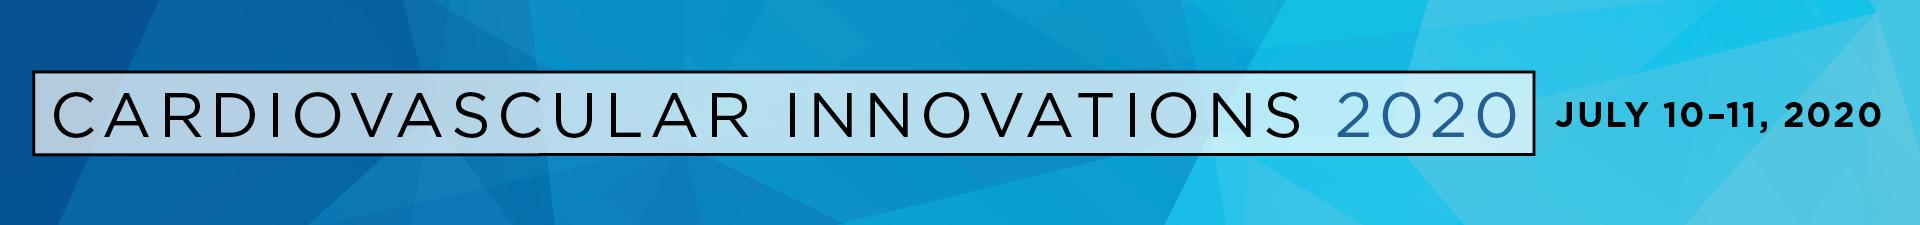 Cardiovascular Innovations 2020 Event Banner